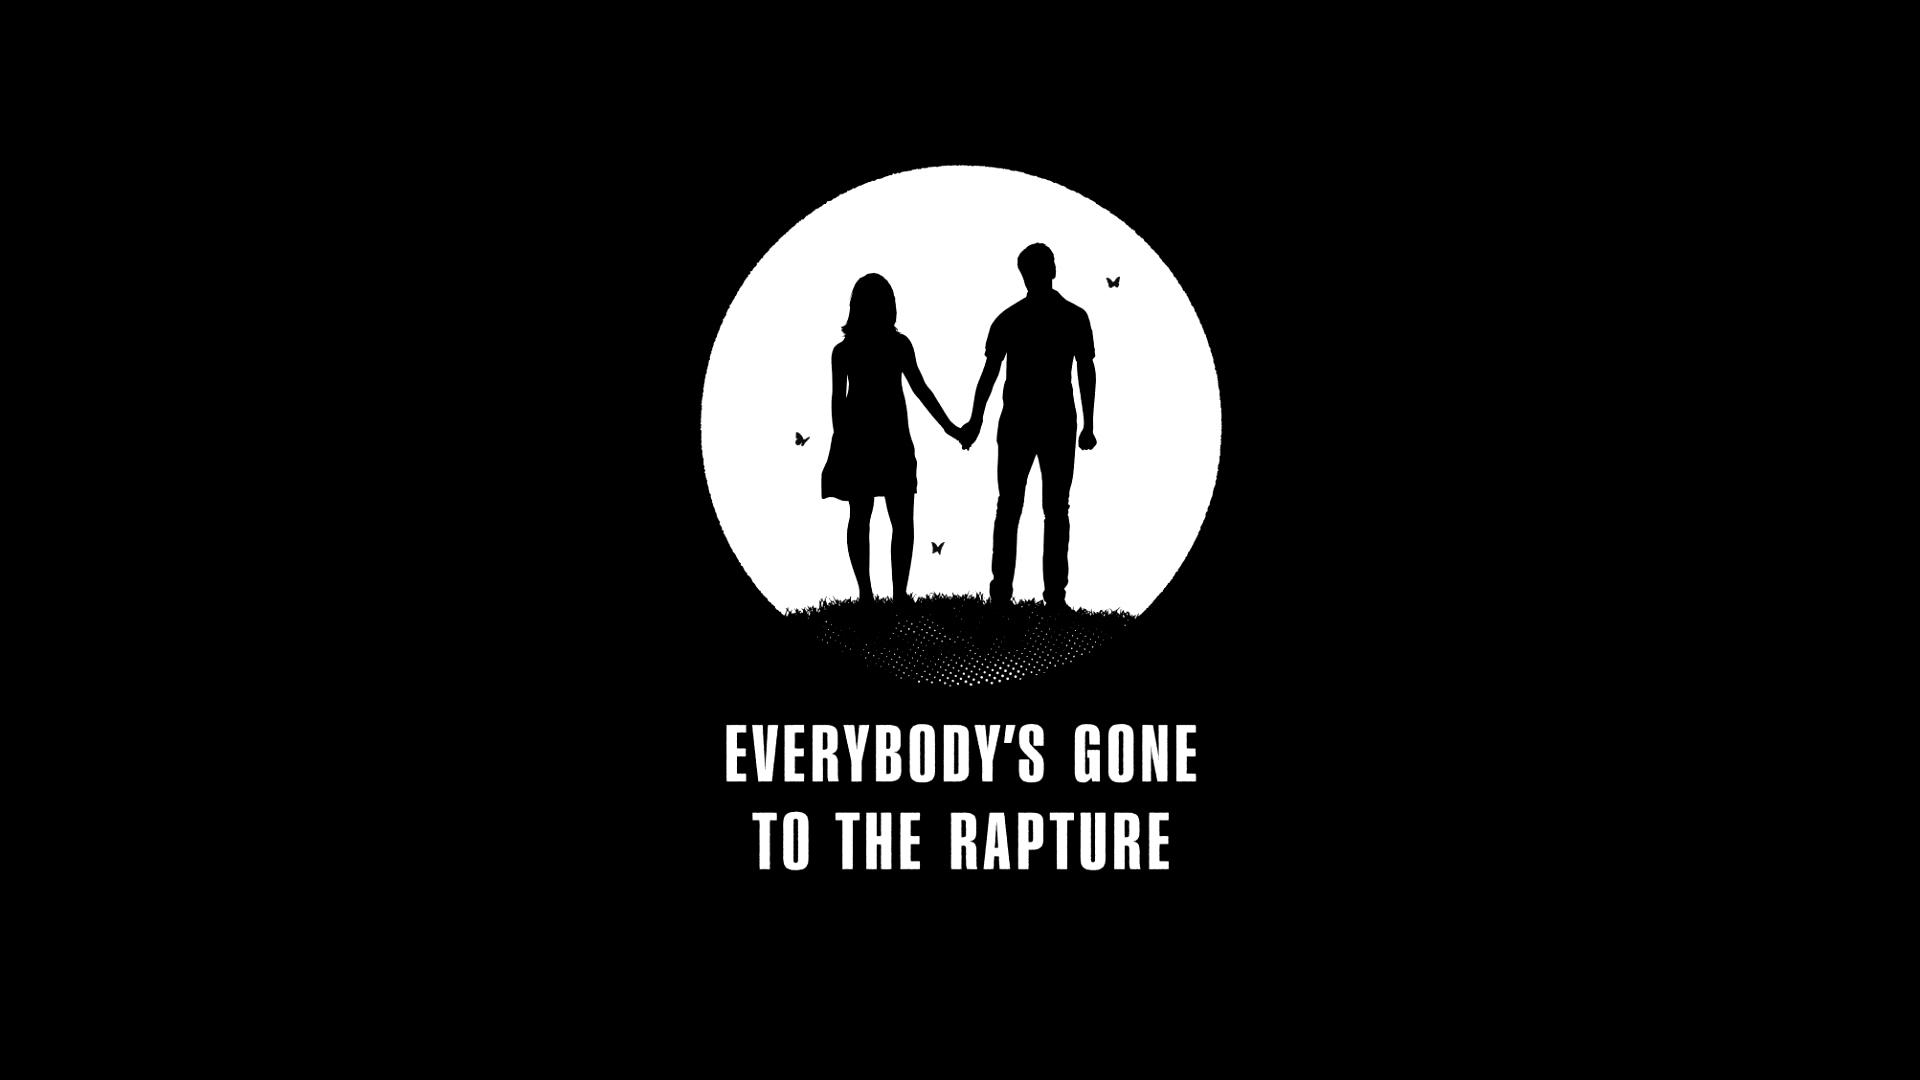 everbody-gone-rapture-0416-01